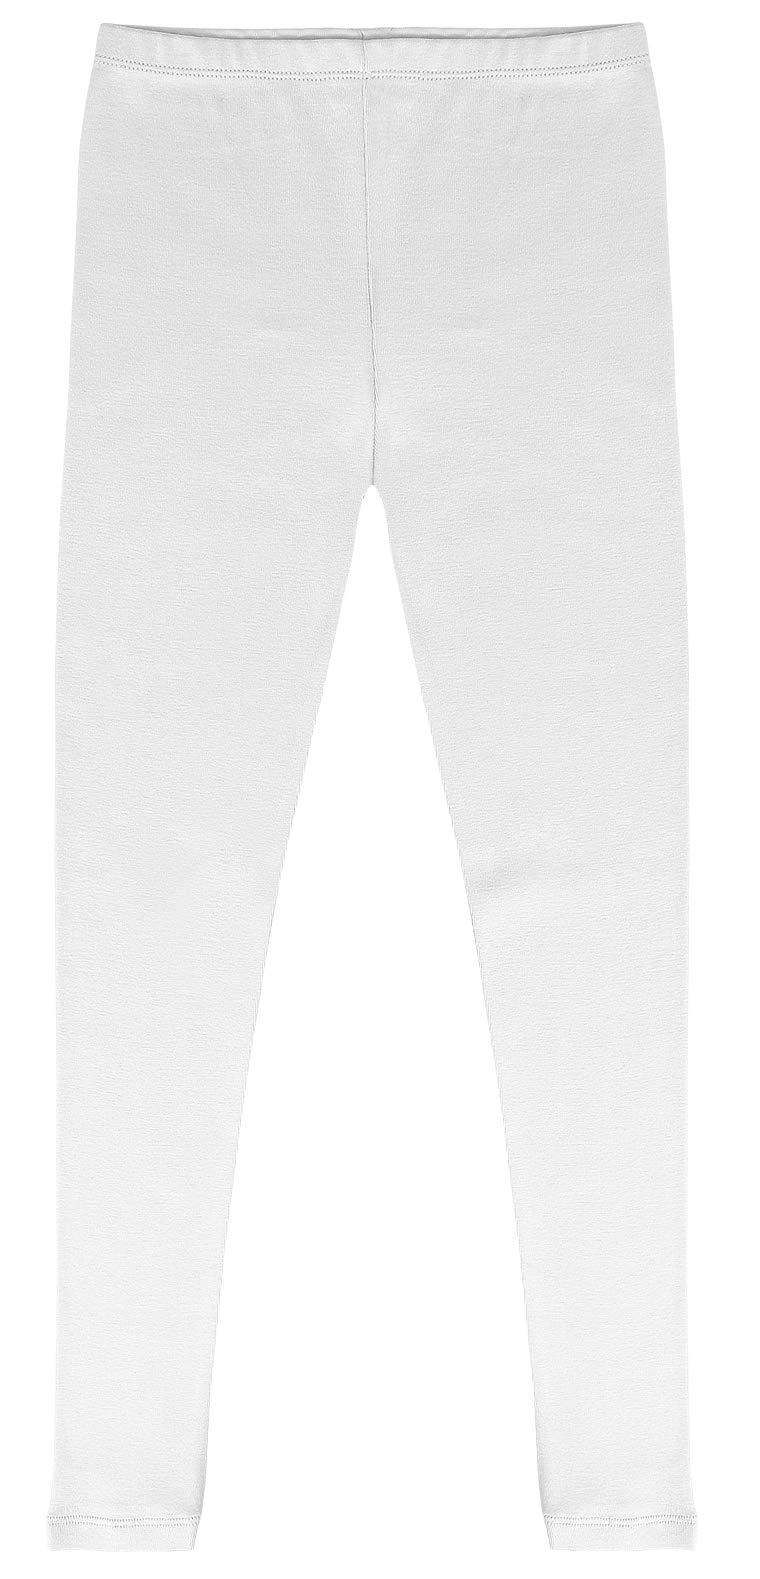 CAOMP Girls'%100 Organic Cotton Leggings for School or Play (11-12, White)